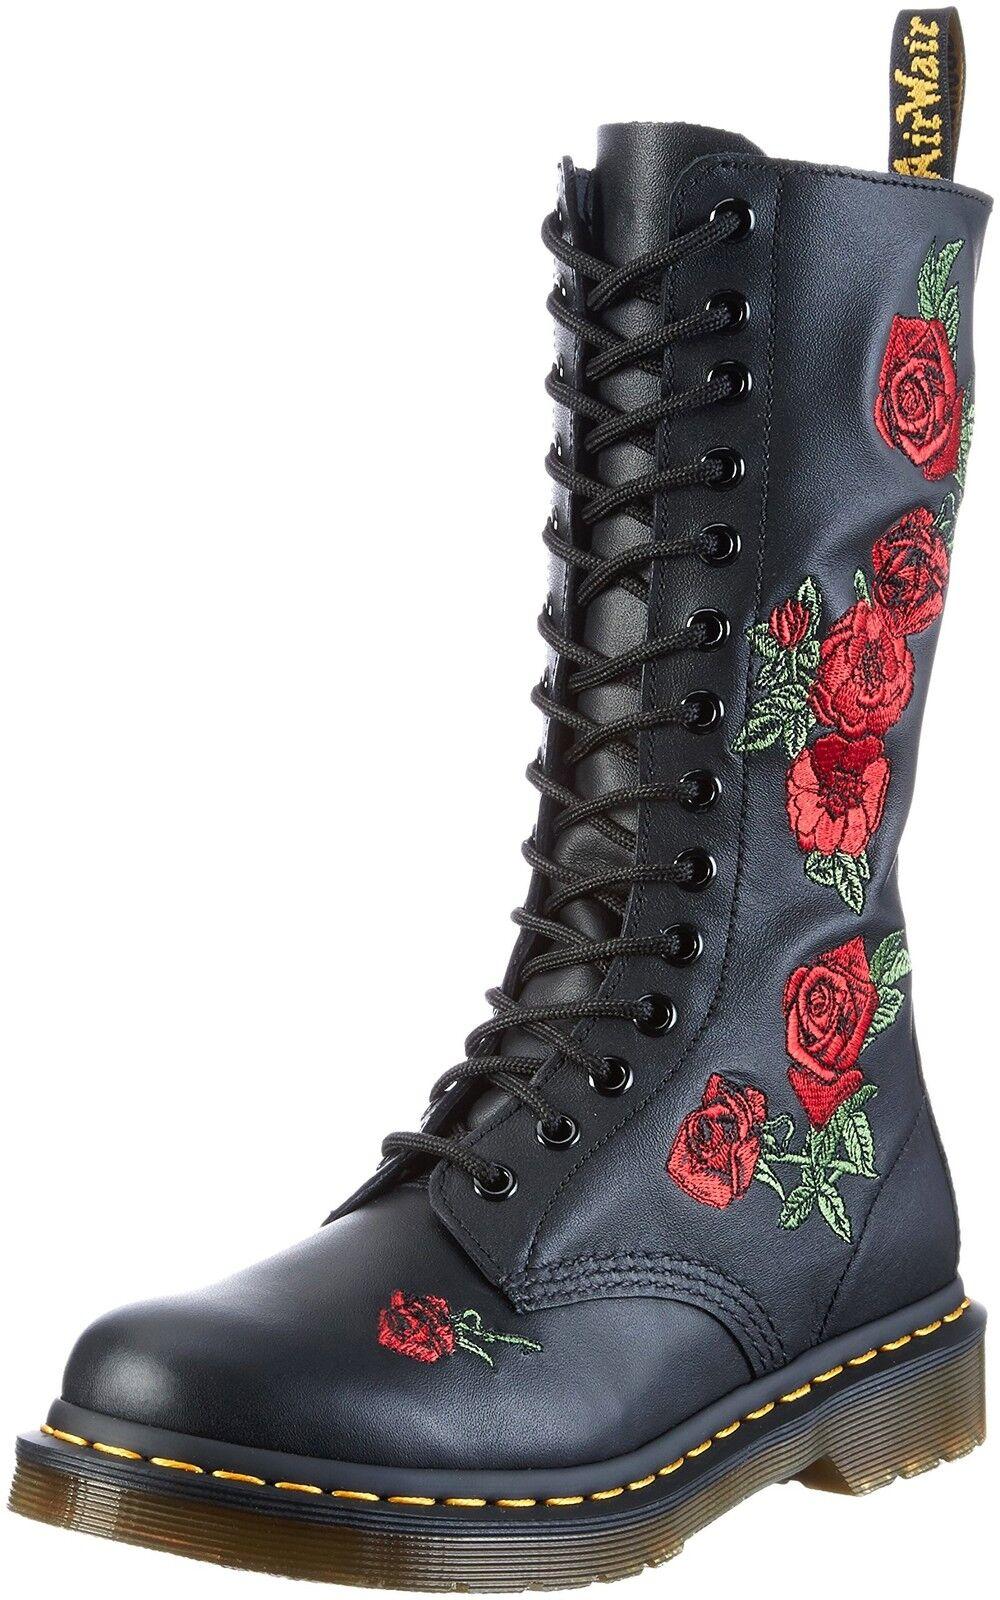 Dr. Martens Women's 14-Eye 14-Eye 14-Eye Vonda Casual Boot Black 5 F(M) UK   7 B(M) US 0499f5